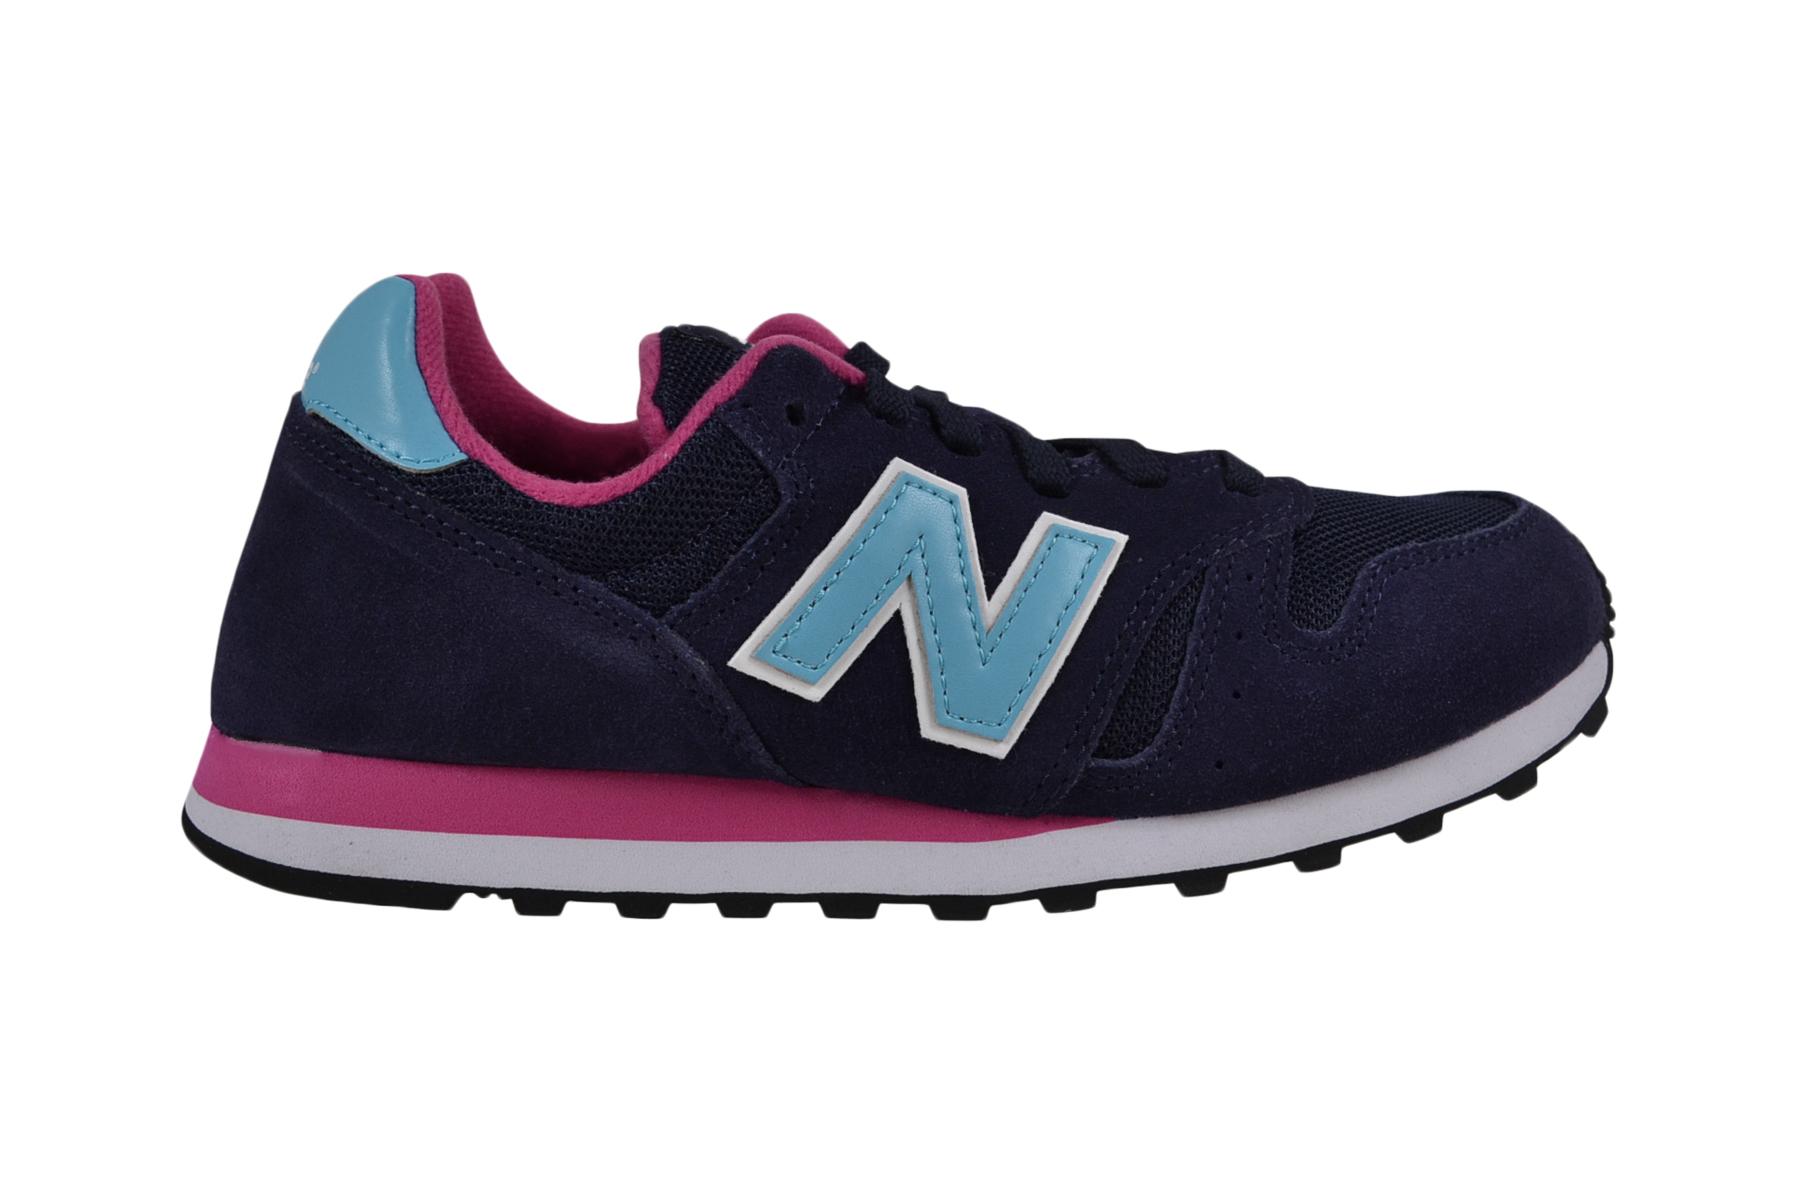 Set-N4-WL373NTP- New Balance WL373 NTP navy